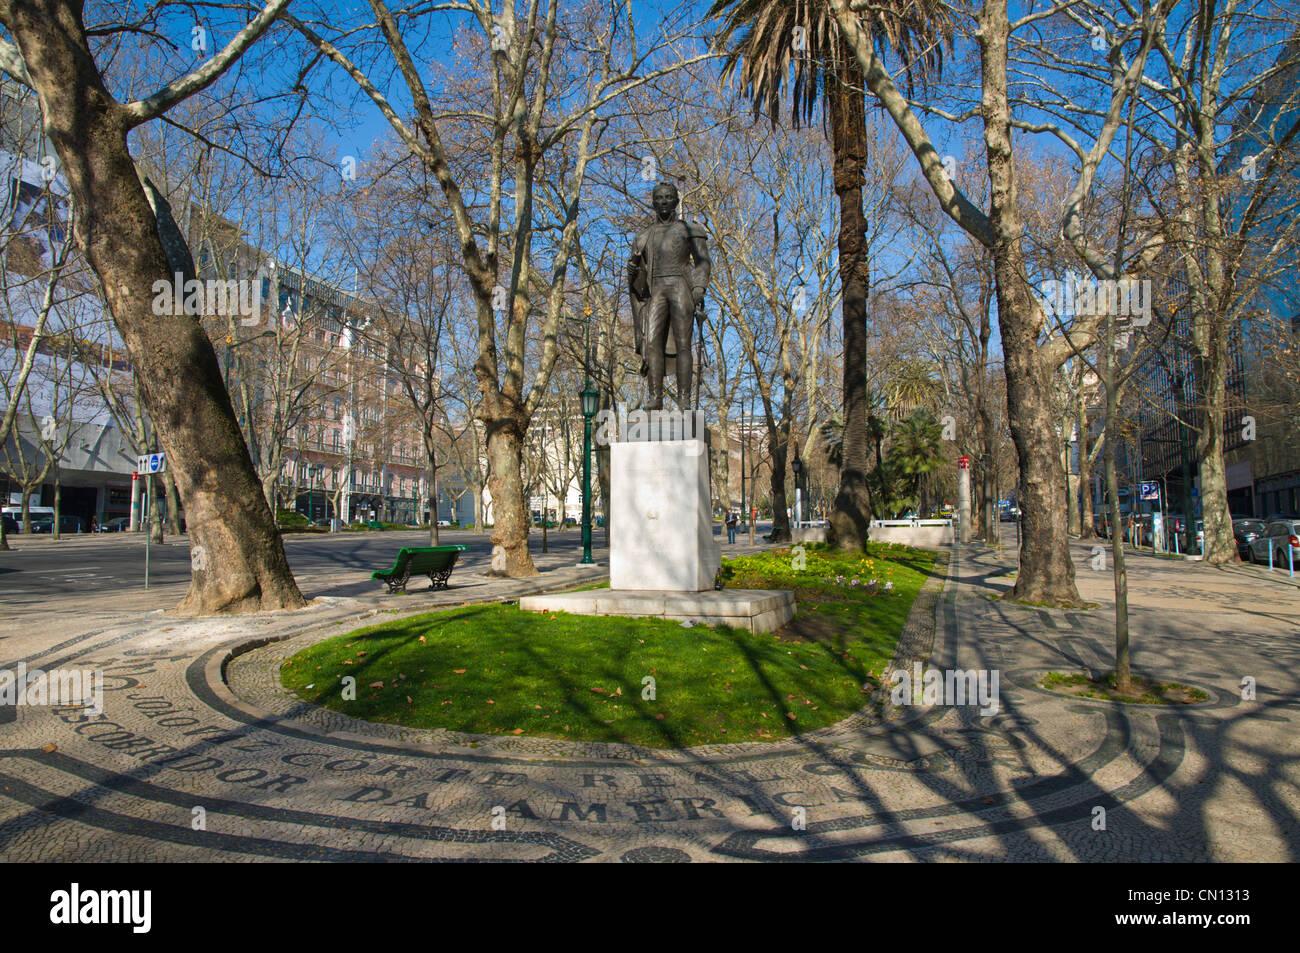 Statue of Joao Vaz Corte Real a Portuguese explorer Avenida de Liberdade boulevard central Lisbon Portugal Europe Stock Photo